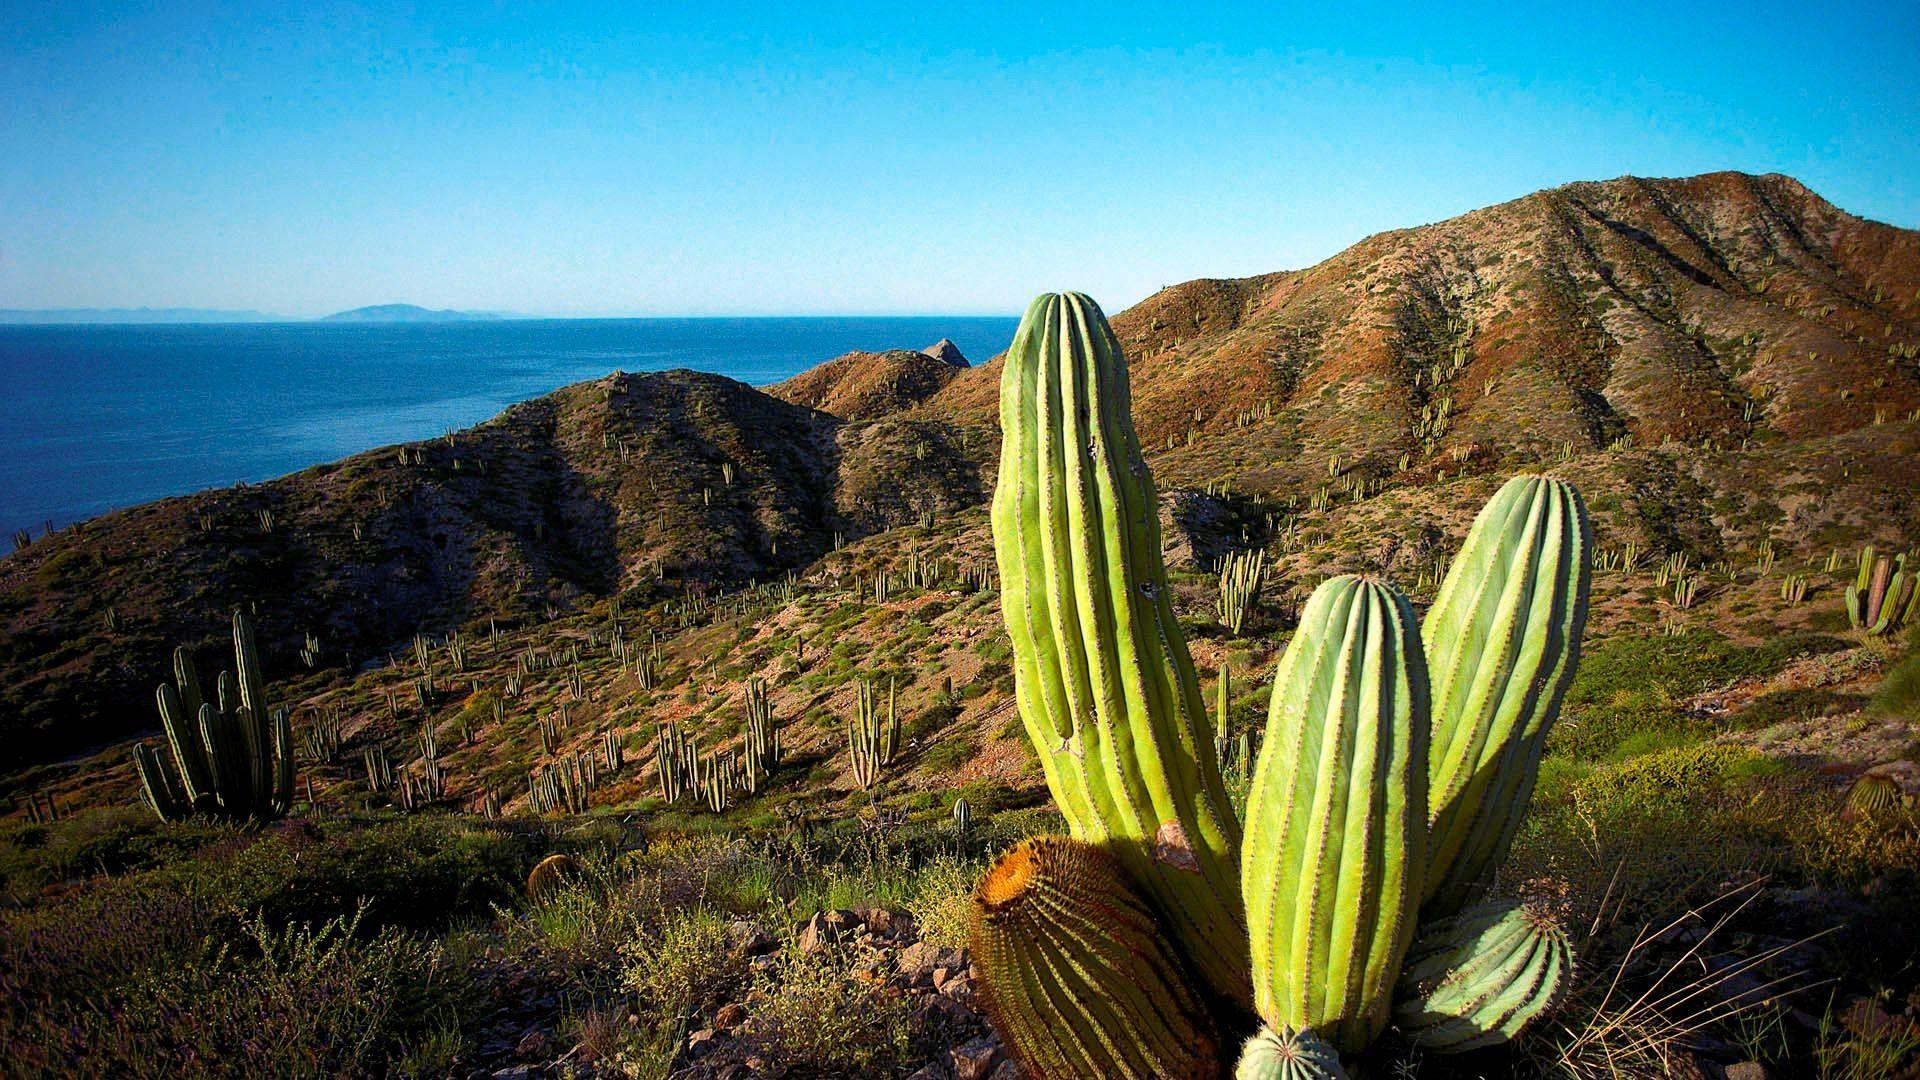 sfondi hd natura deserto e cactus sfondi hd gratis